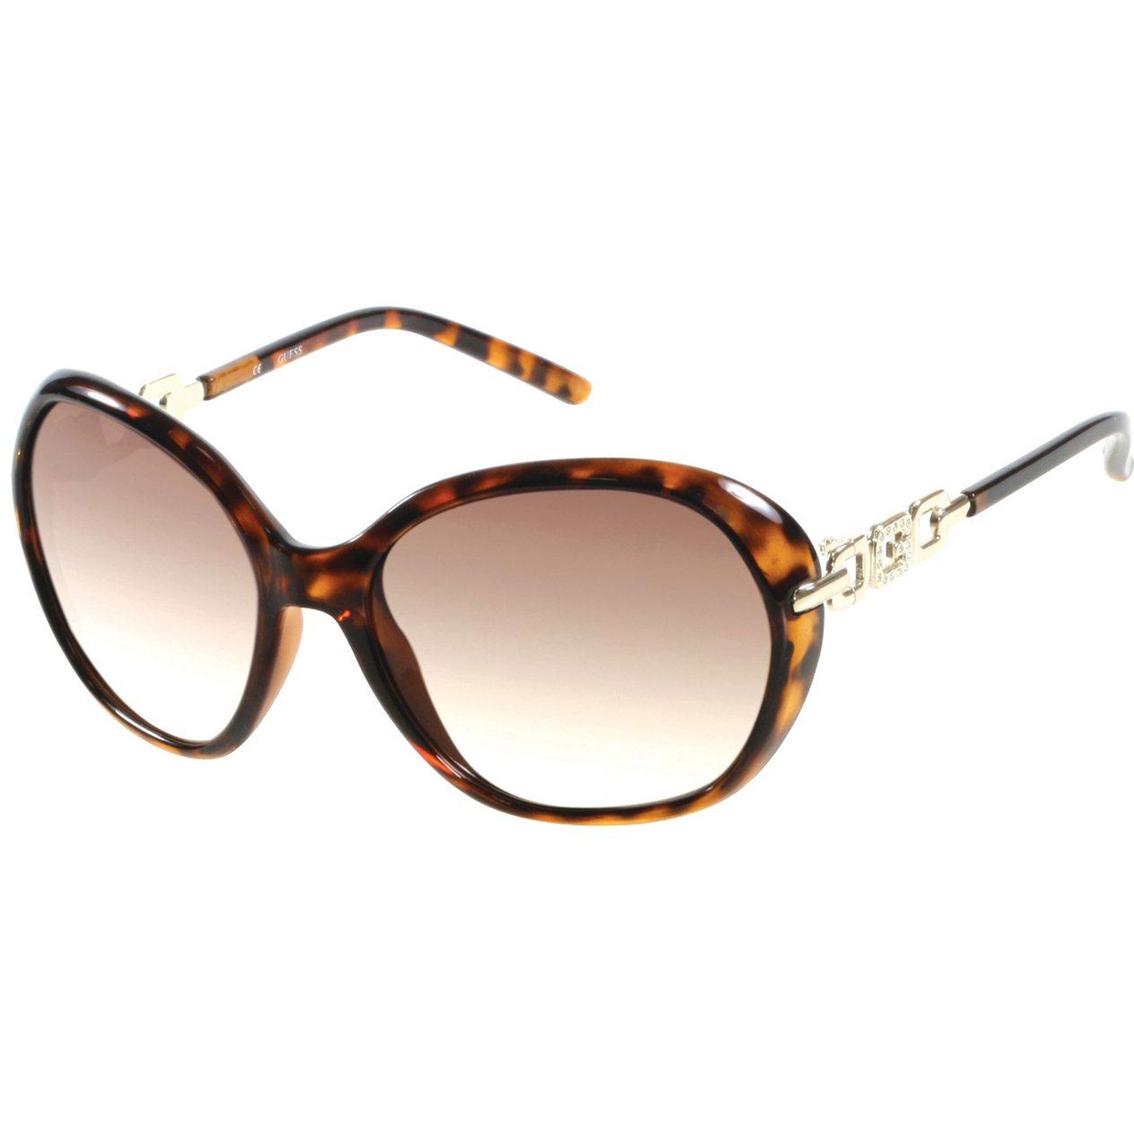 cheap>guess sunglasses,adidas white shirt,adidas superstar ...